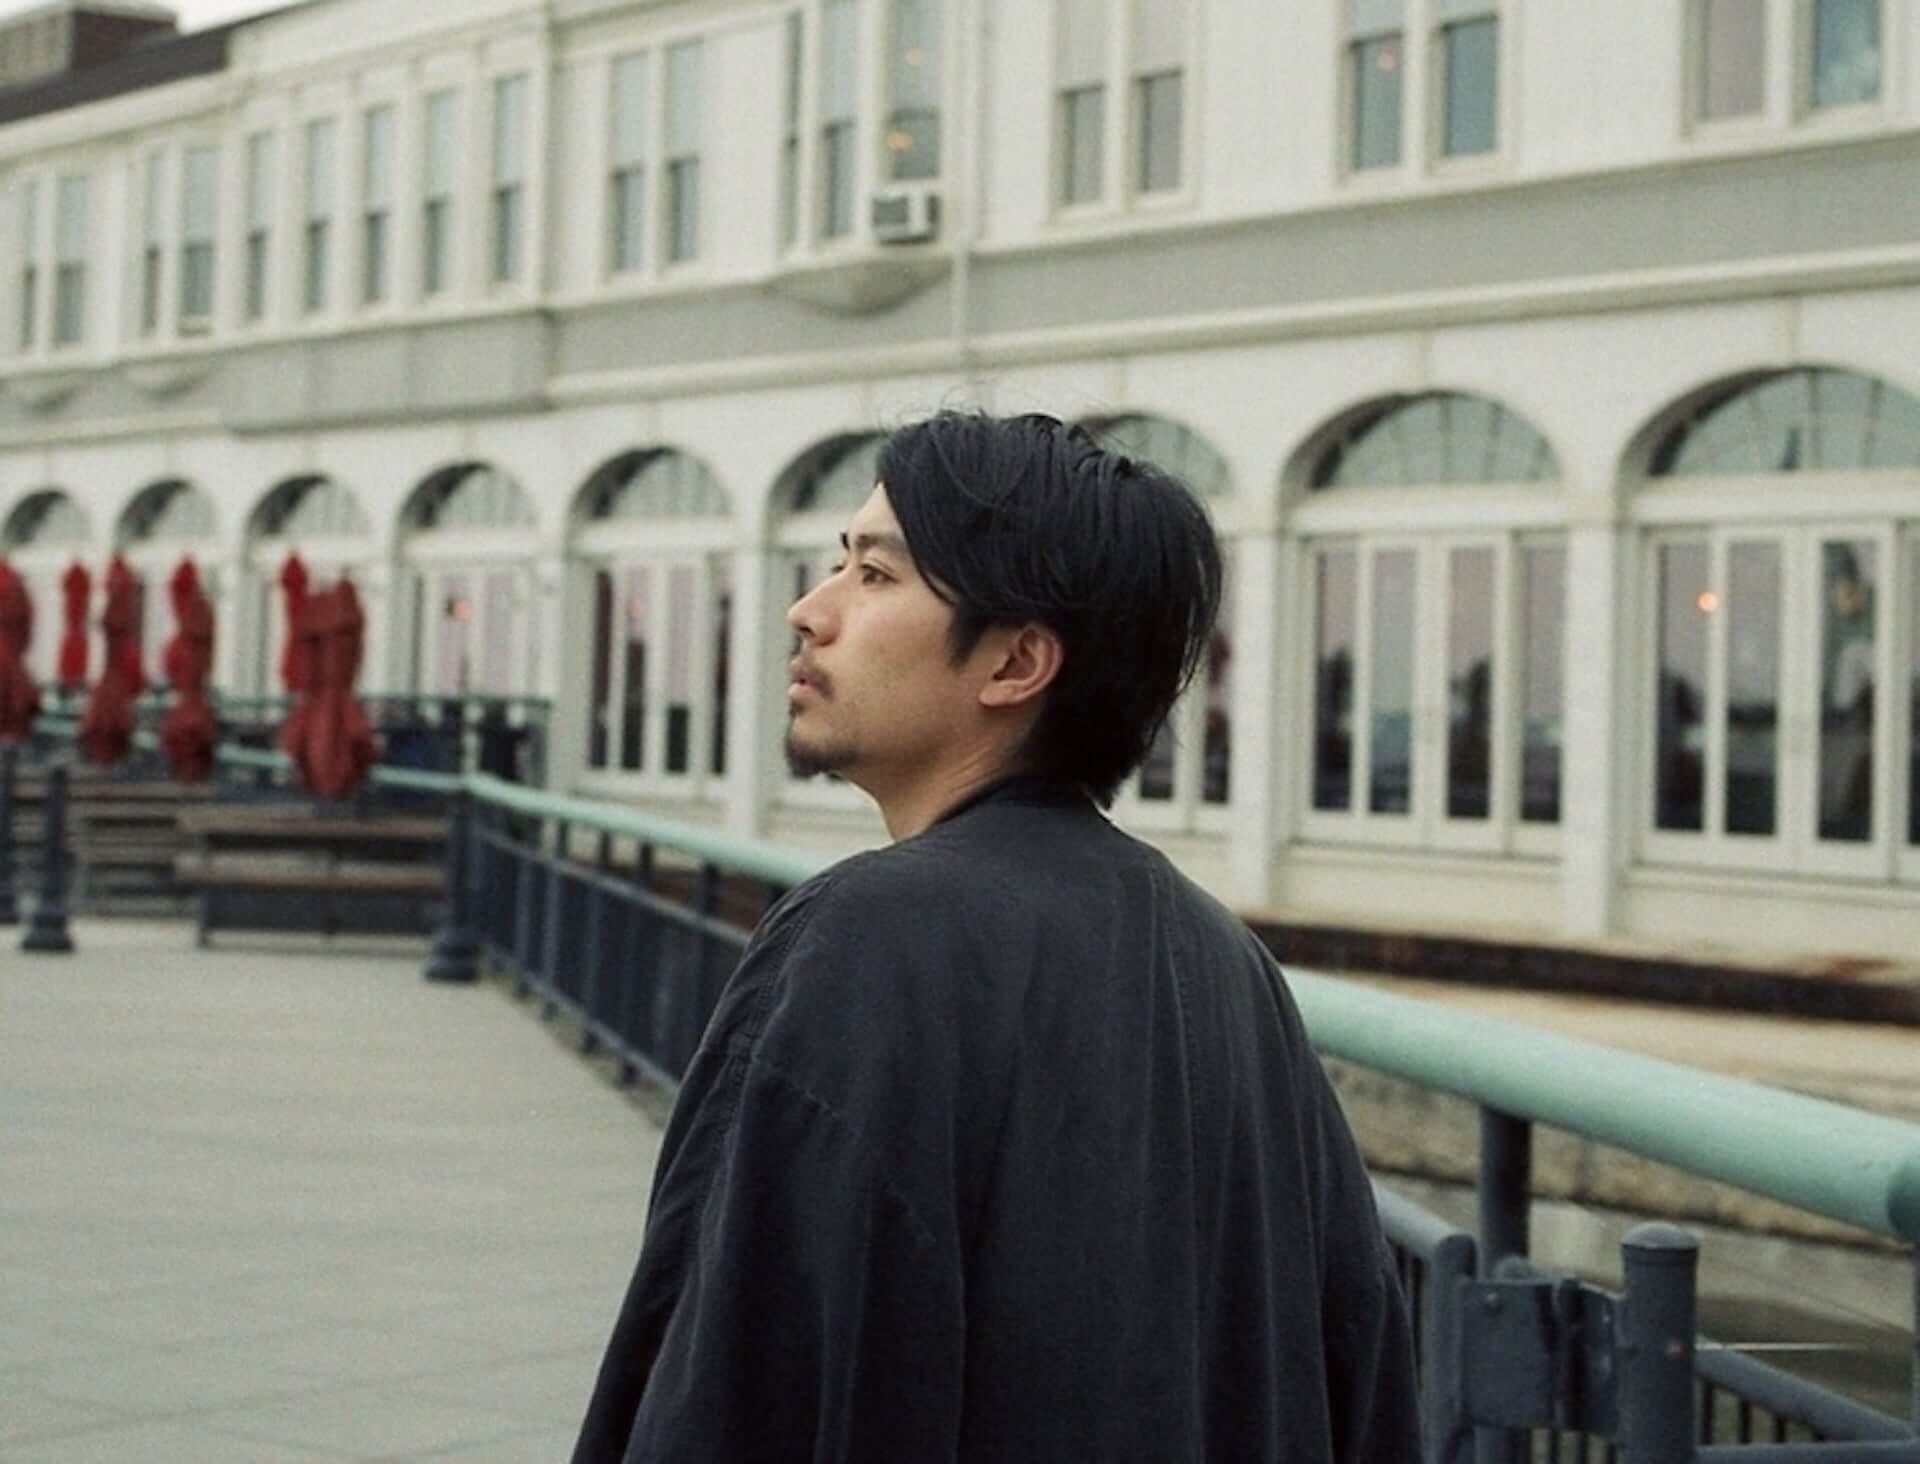 Seiho、映像作家・山田智和6年ぶりのオリジナル作品に参加|10台のマルチモニターを使ったアート展示 artculture190801seiho_6-1920x1464